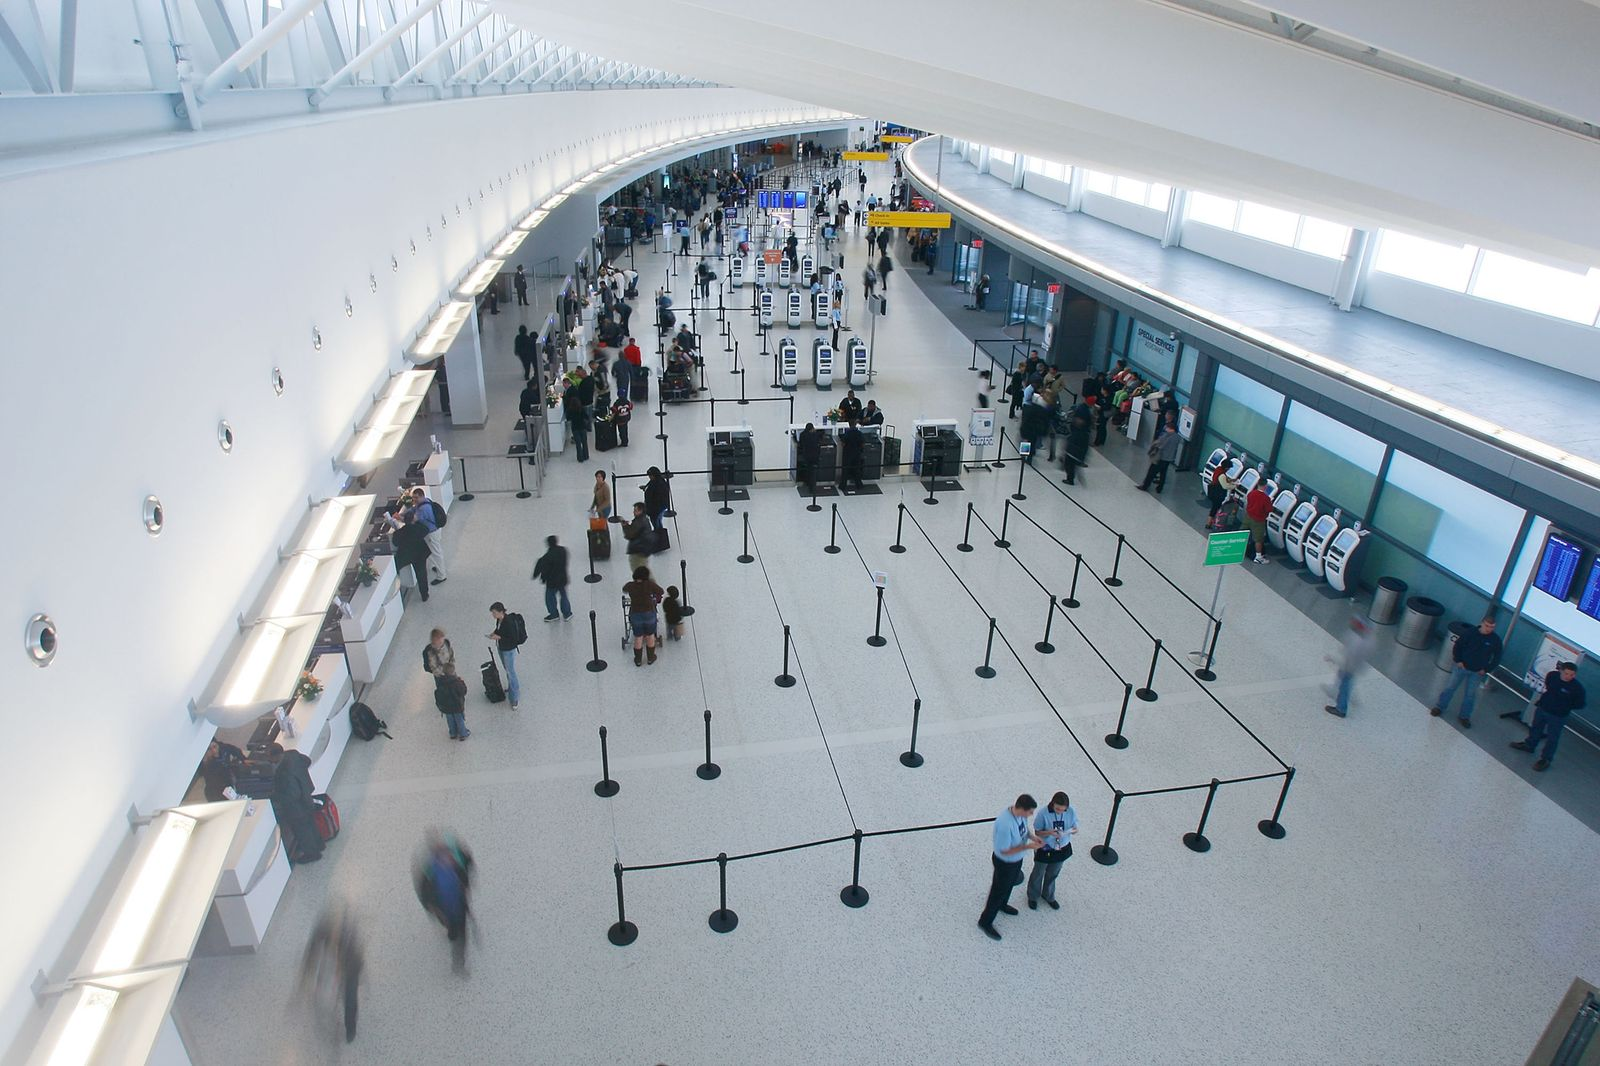 Flughafen / JFK / New York / Terminal 5